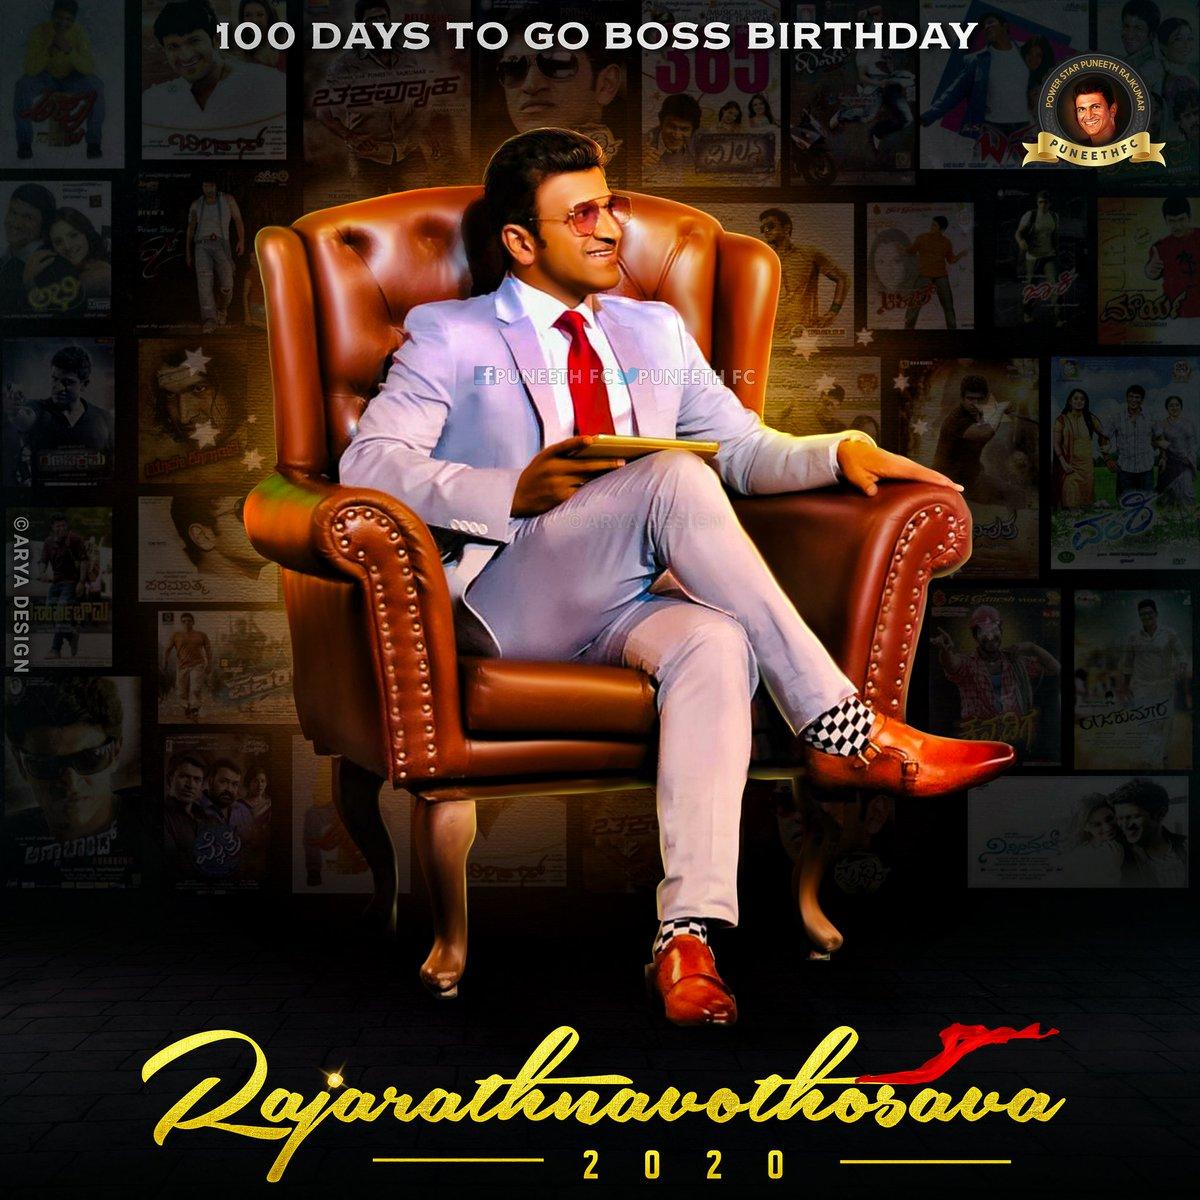 A Powerpacked Common DP For All Powerful Fans For PowerStar's 100 Days To Go Birthday ❤️ Change Yours Now 🤗  #TheRajkumars #100DaysToGoAppuBossBirthday #Rajarathnavothosava2020 #ರಾಜರತ್ನೋತ್ಸವ2020 #Appu #PowerStar #PuneethRajkumar #PuneethFC